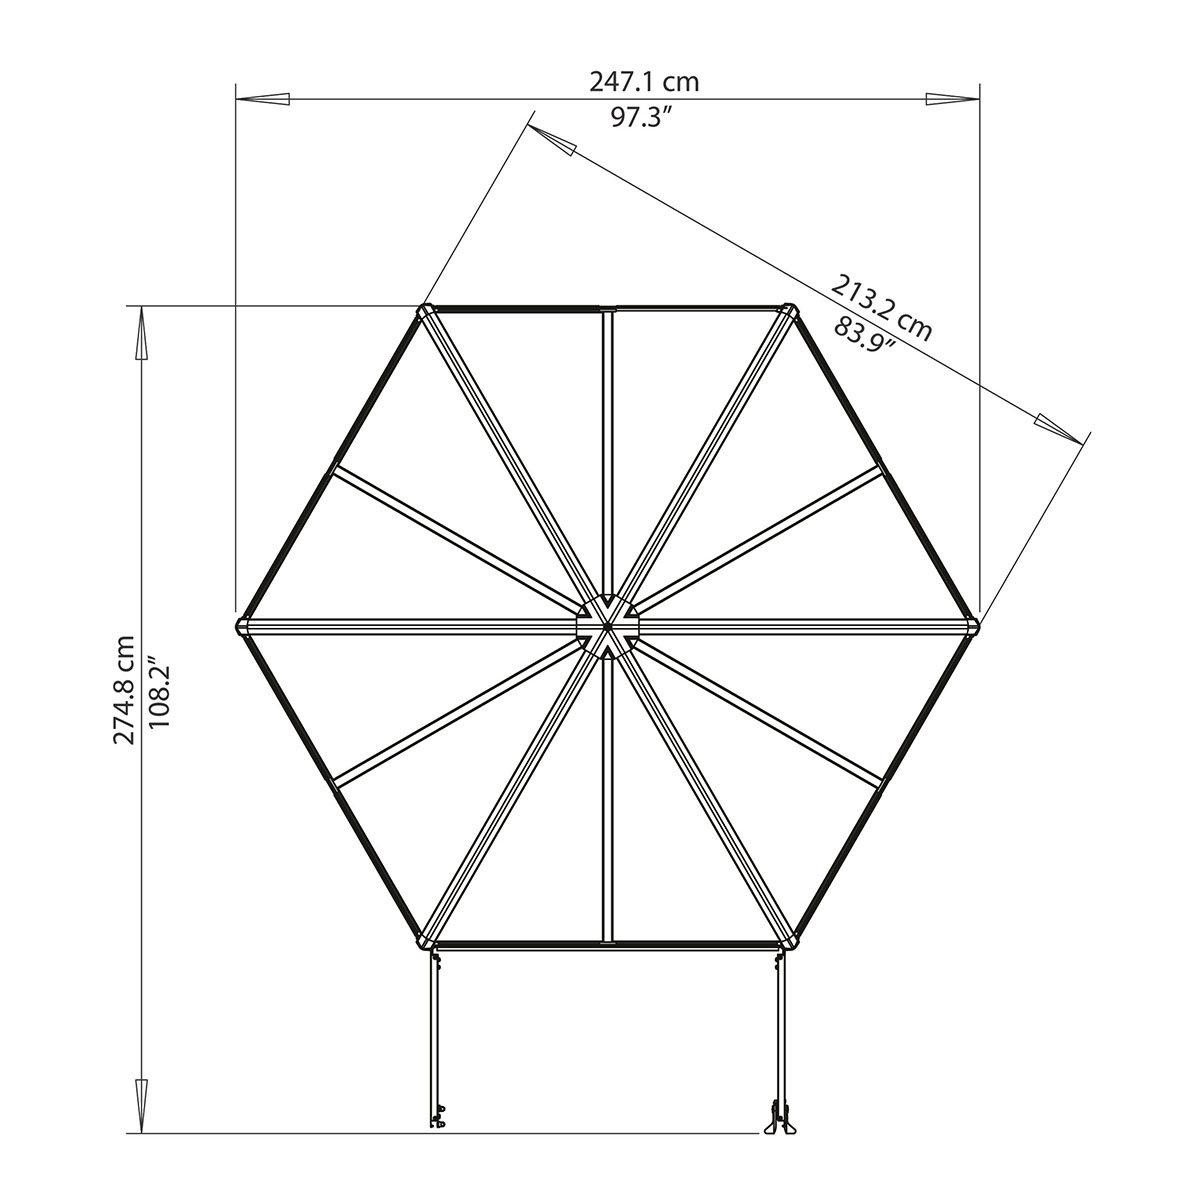 Gewächshaus Oasis Hexagonal, 247 x 213 x 267 cm, Aluminium, anthrazit | #6